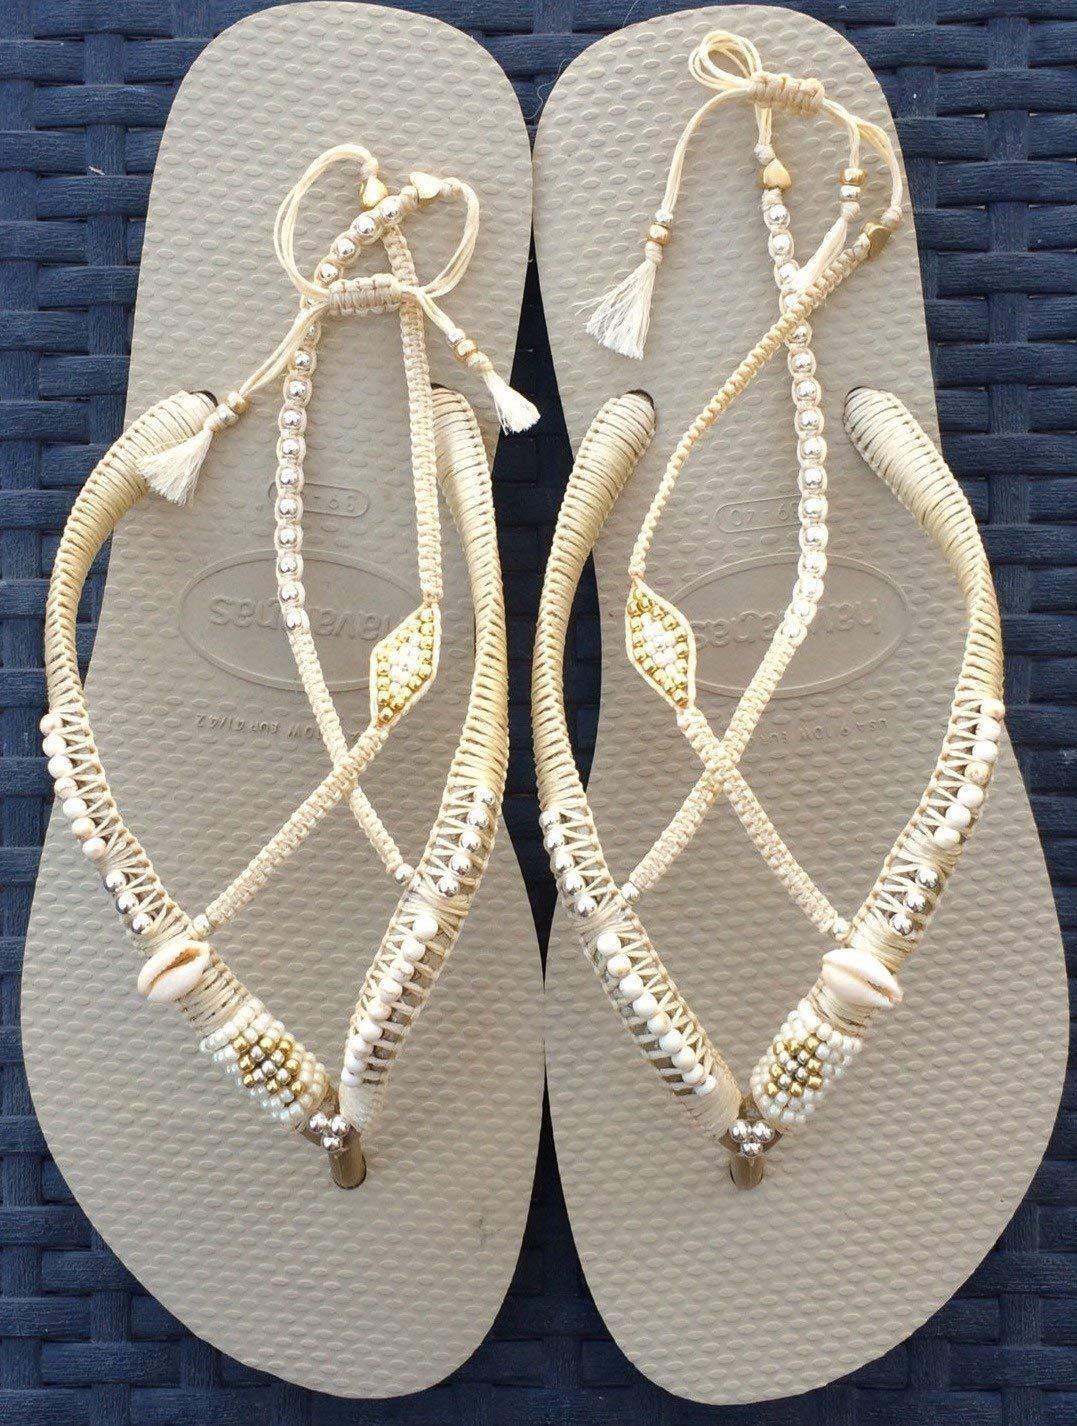 Unique Women's Sandals, Boho Wedding Flat Shoes, Hippie Bridal Cream Beaded Flip Flops with Anklet, Sizes 5-12 US, Handmade Designer